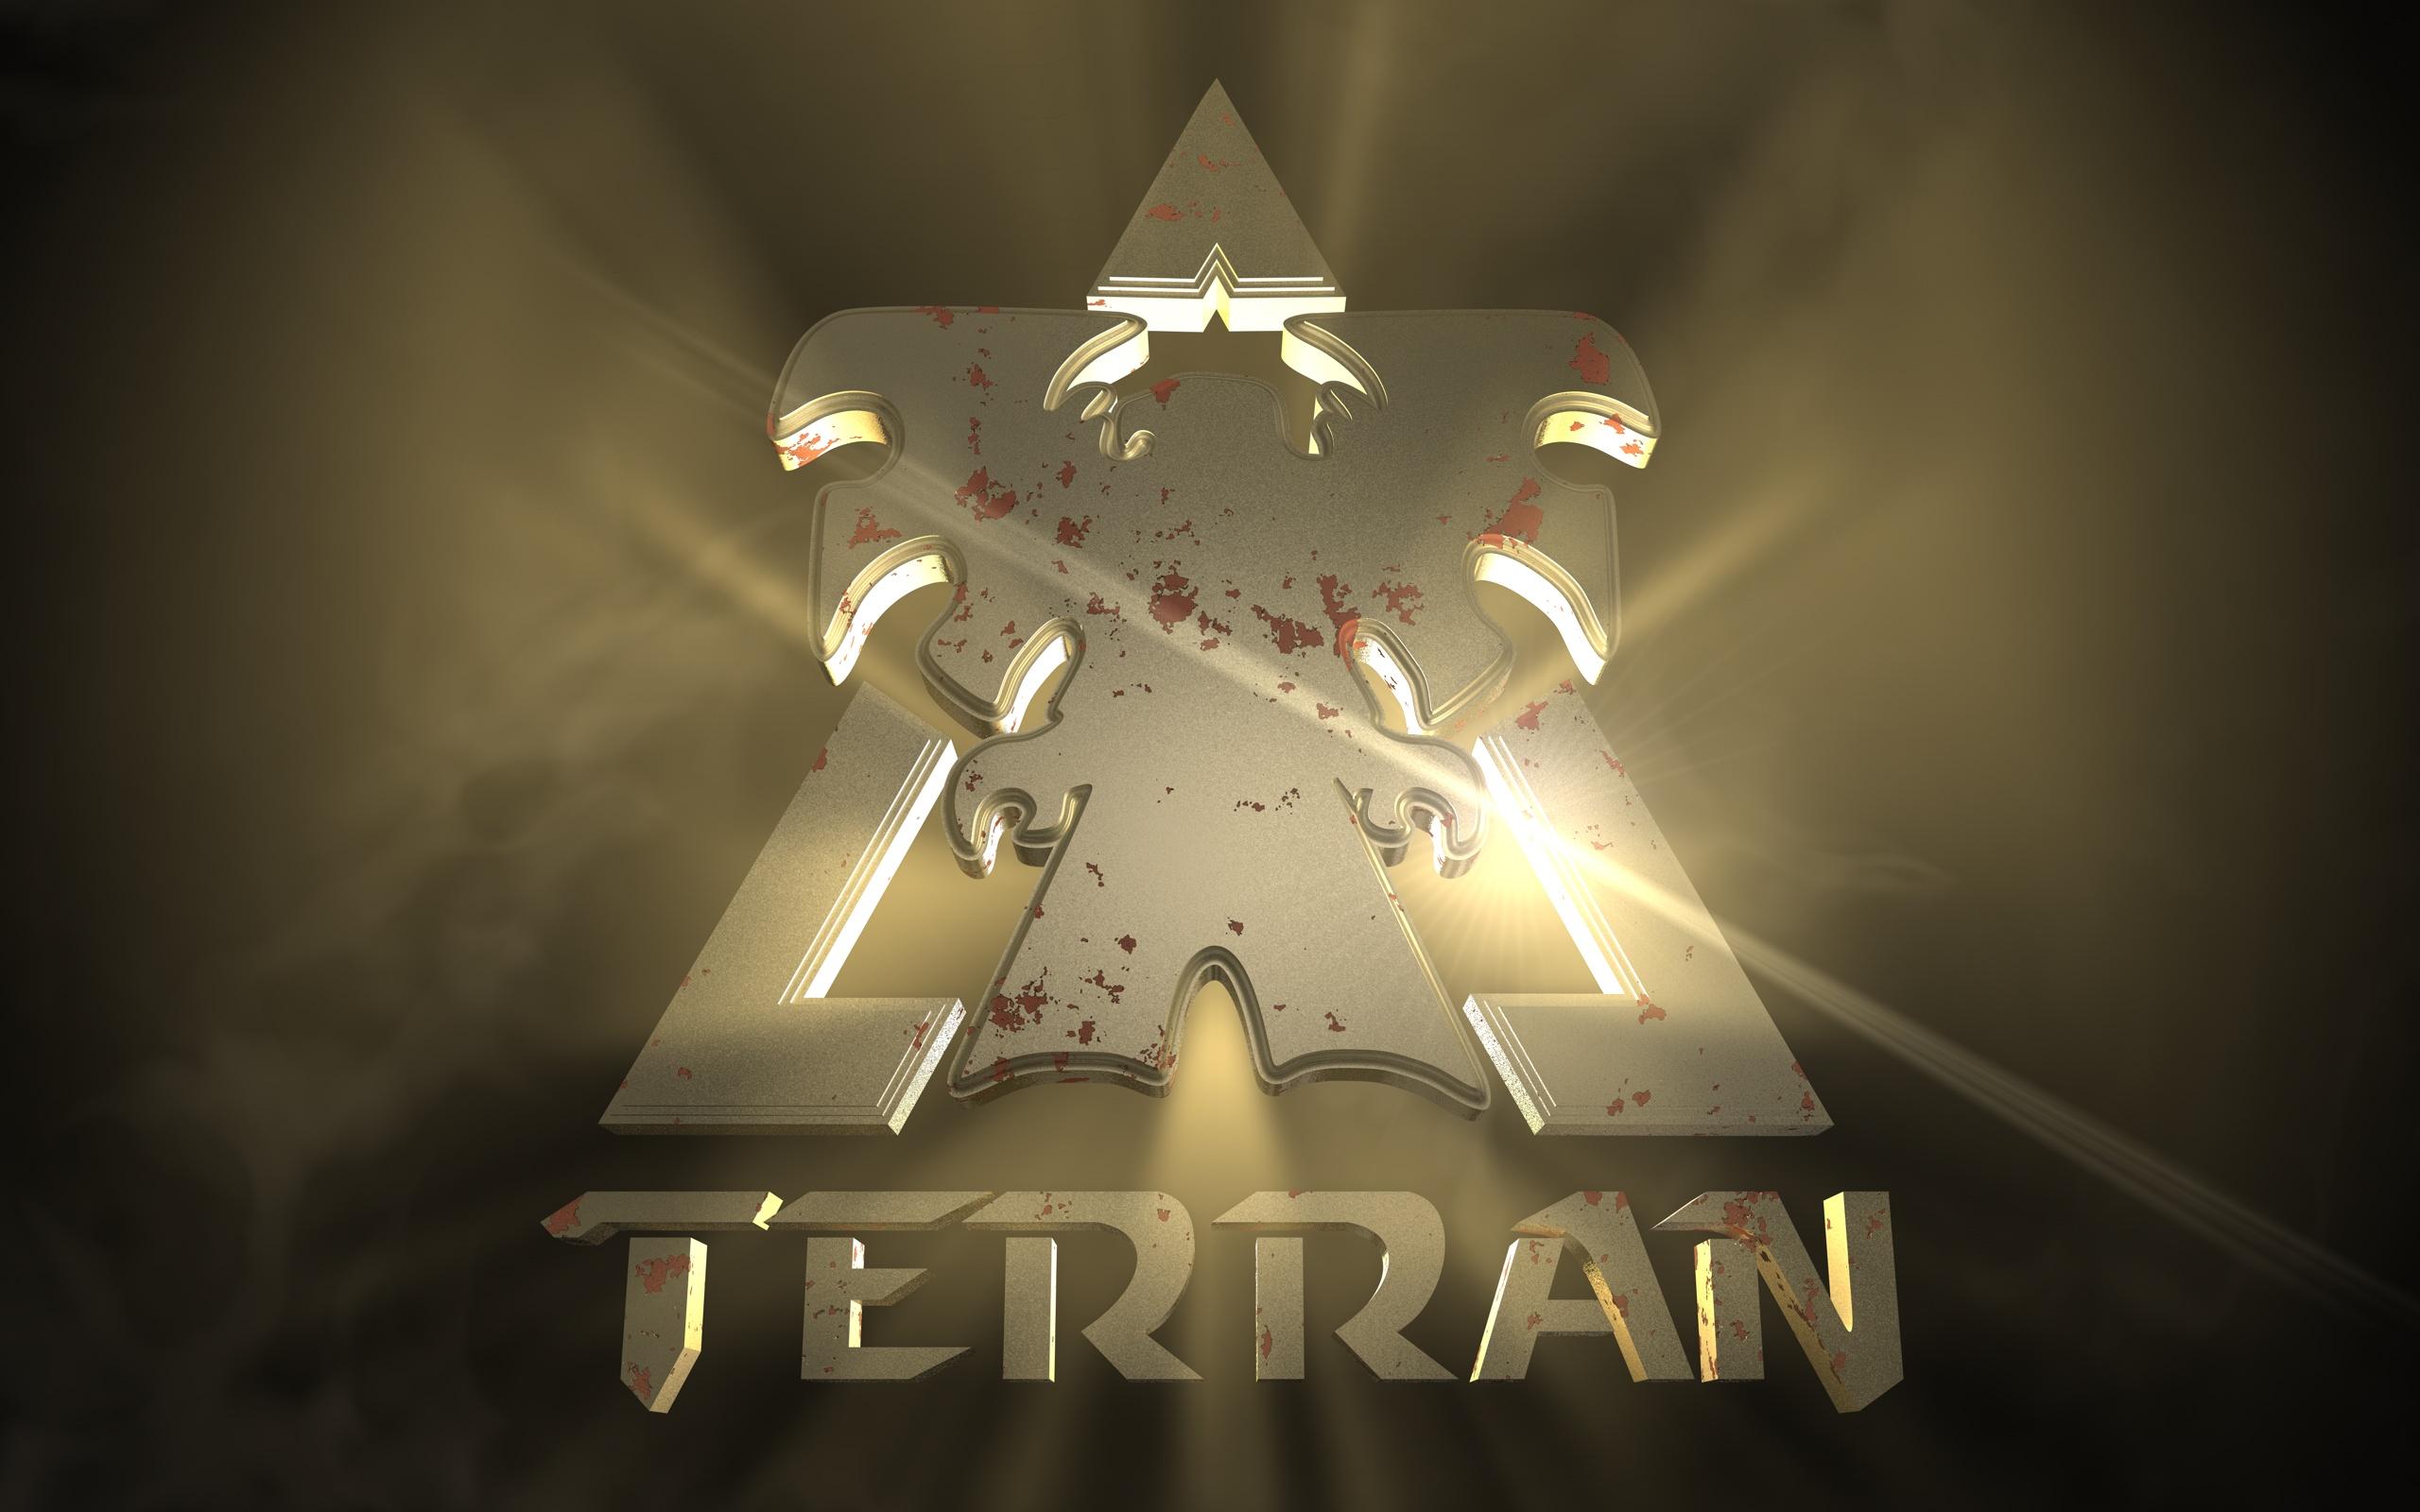 Starcraft Wallpaper Hd Terran S Logo Hd Wallpaper Background Image 2560x1600